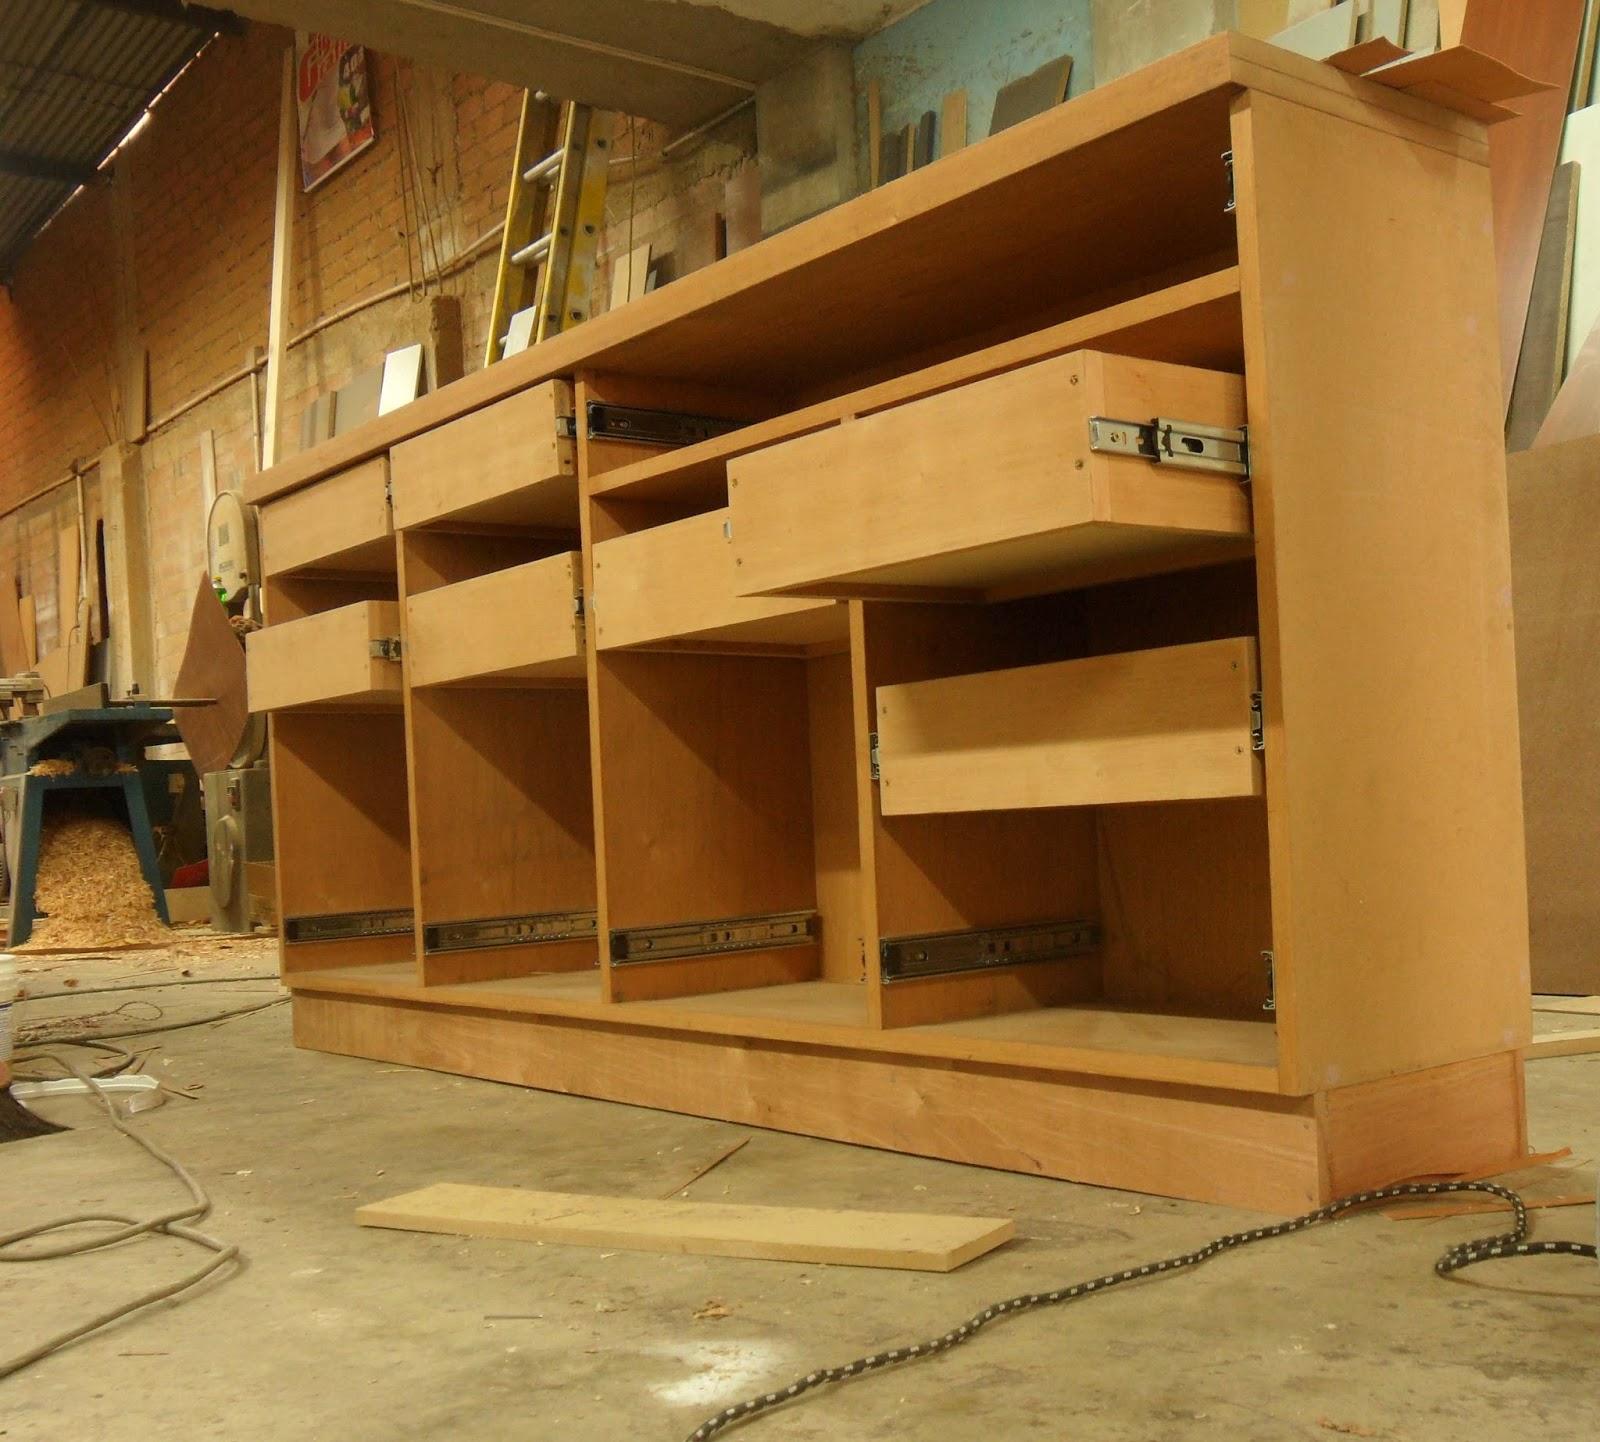 Oniria obra en proceso mueble bar for Muebles bar diseno